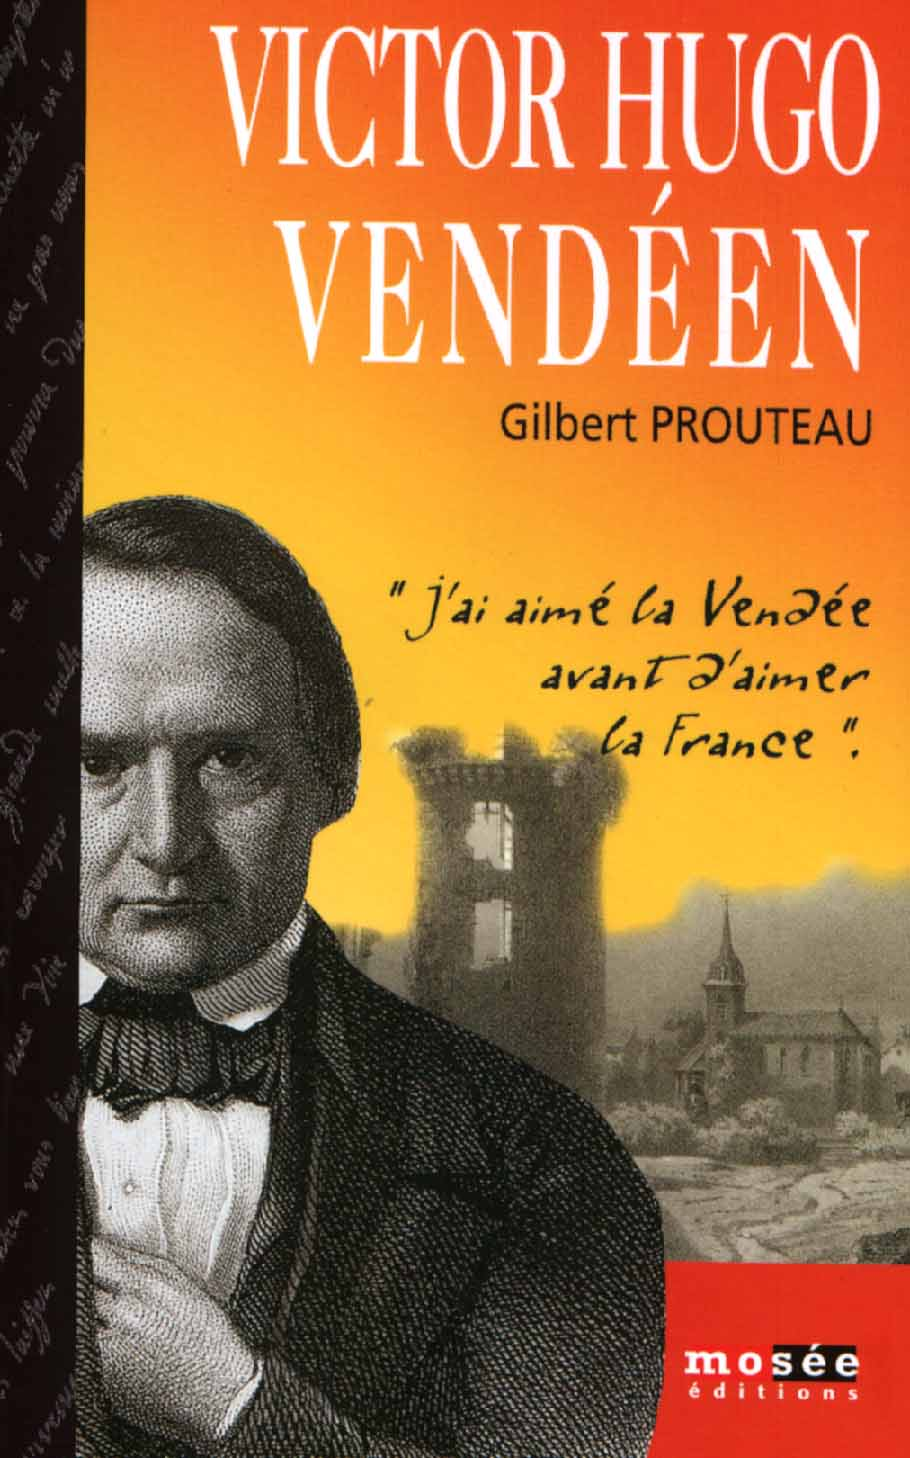 Gilbert Prouteau, page 1 Livre Victor Hugo Vendeen, 2002